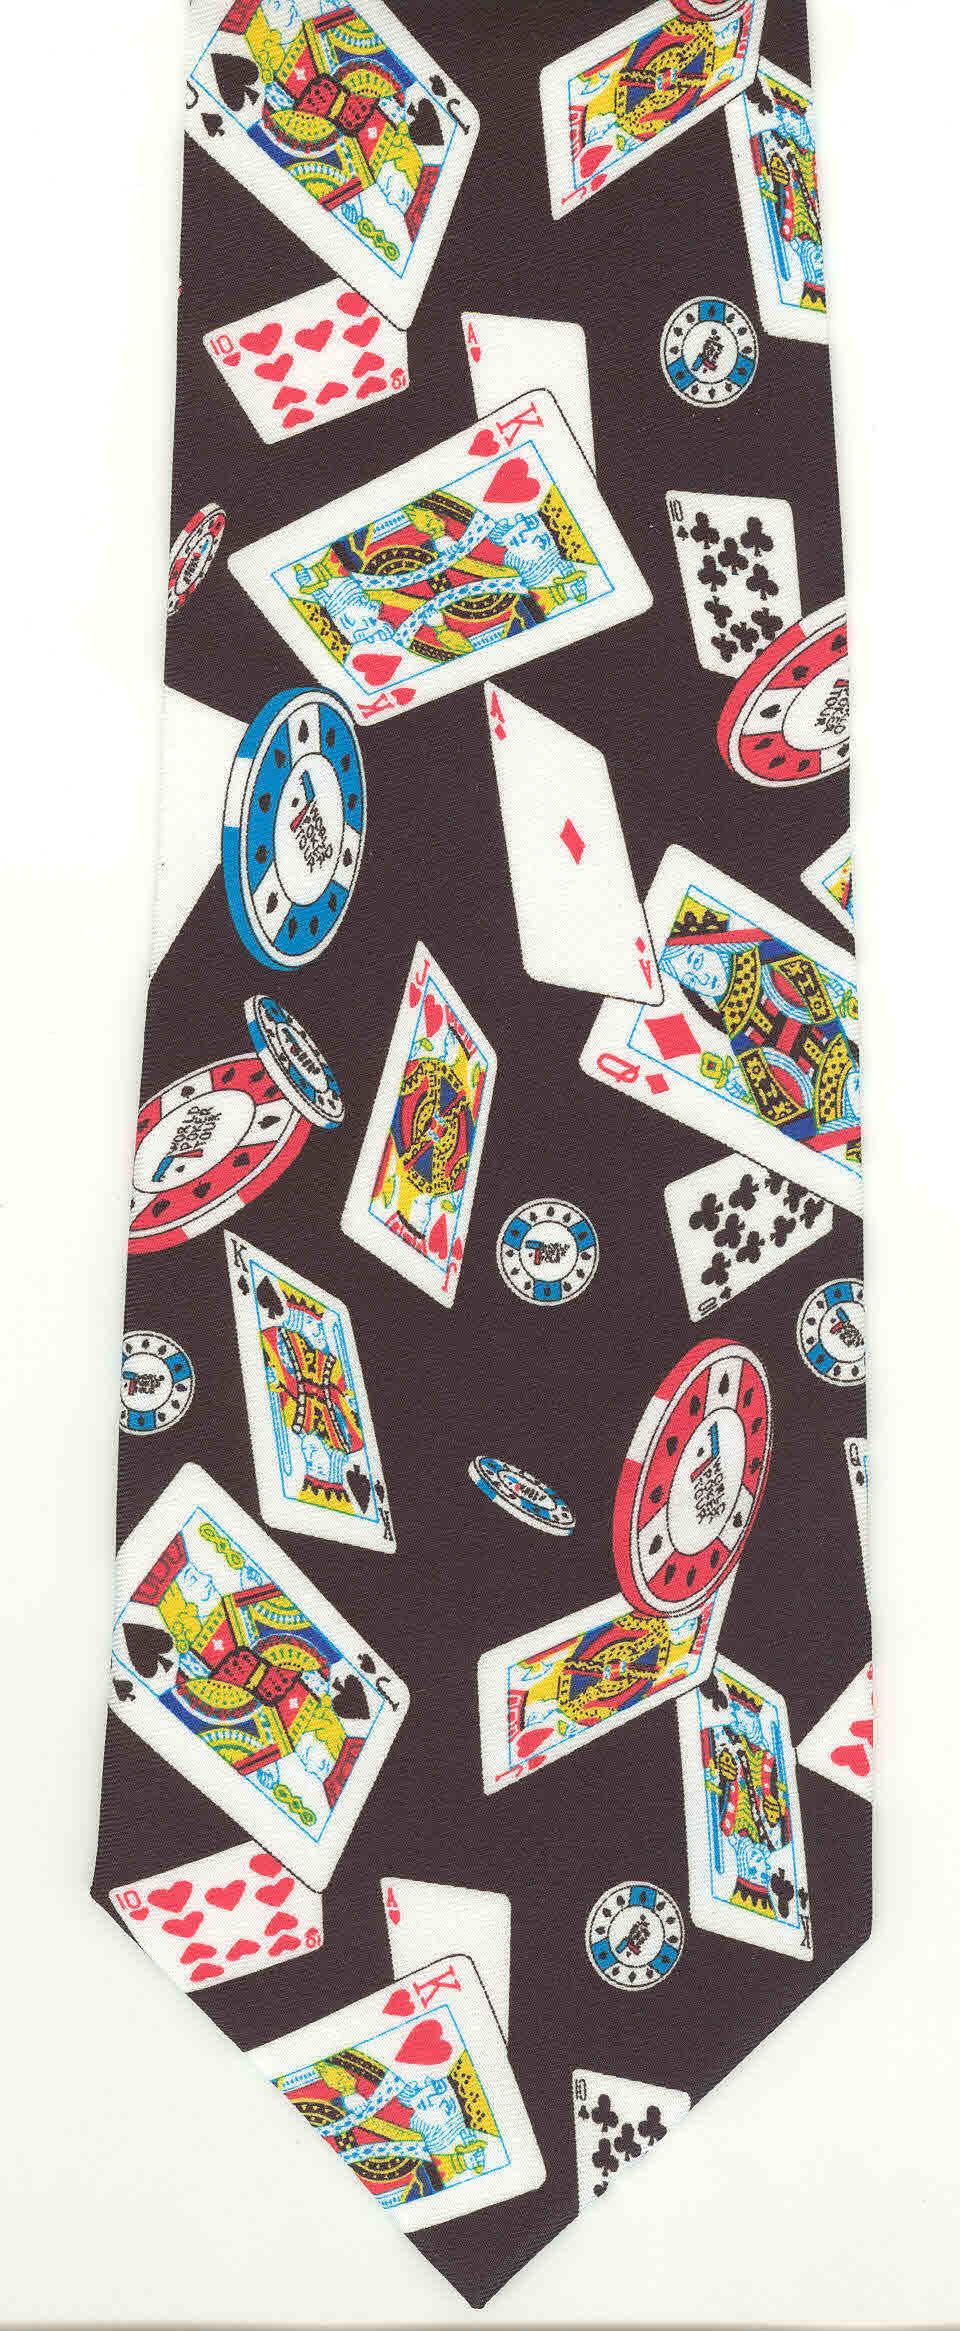 014 WPT Cards.jpg